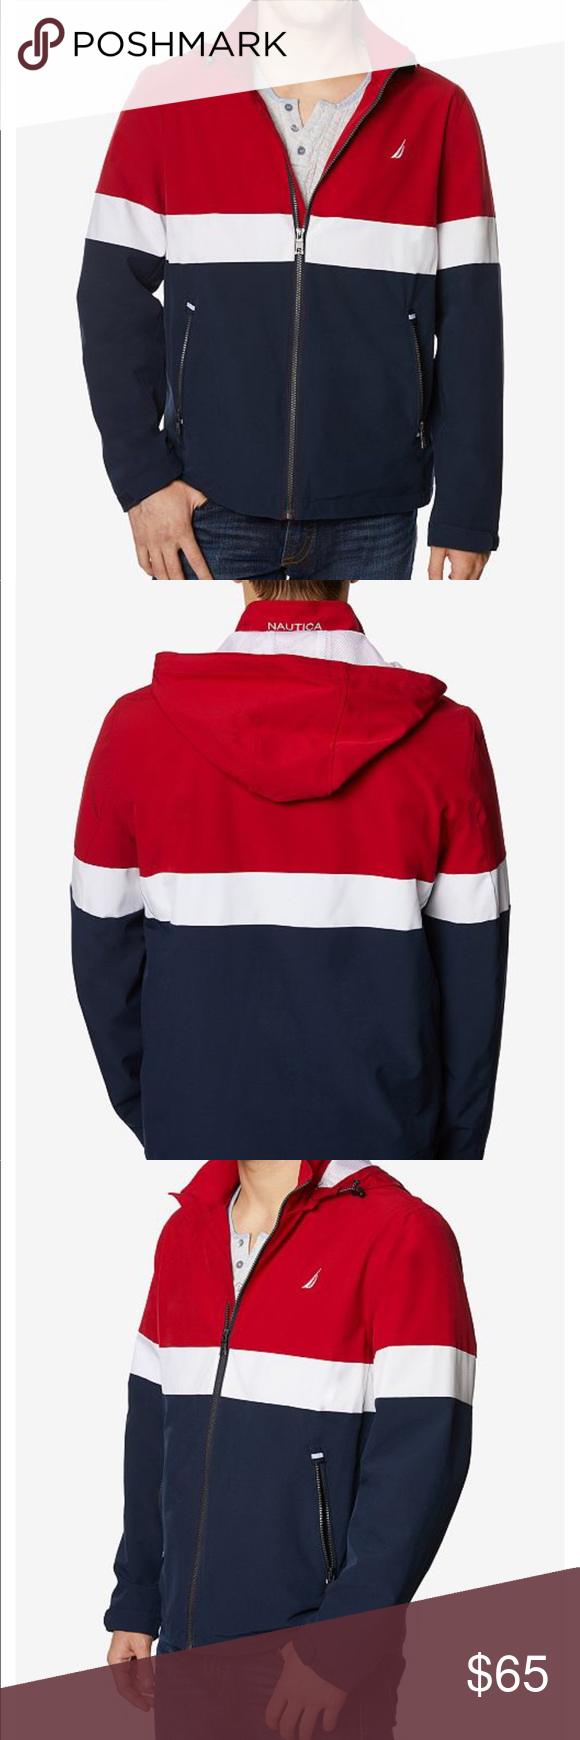 Nwt Men S Nautica Jacket Clothes Design Jackets Fashion [ 1740 x 580 Pixel ]